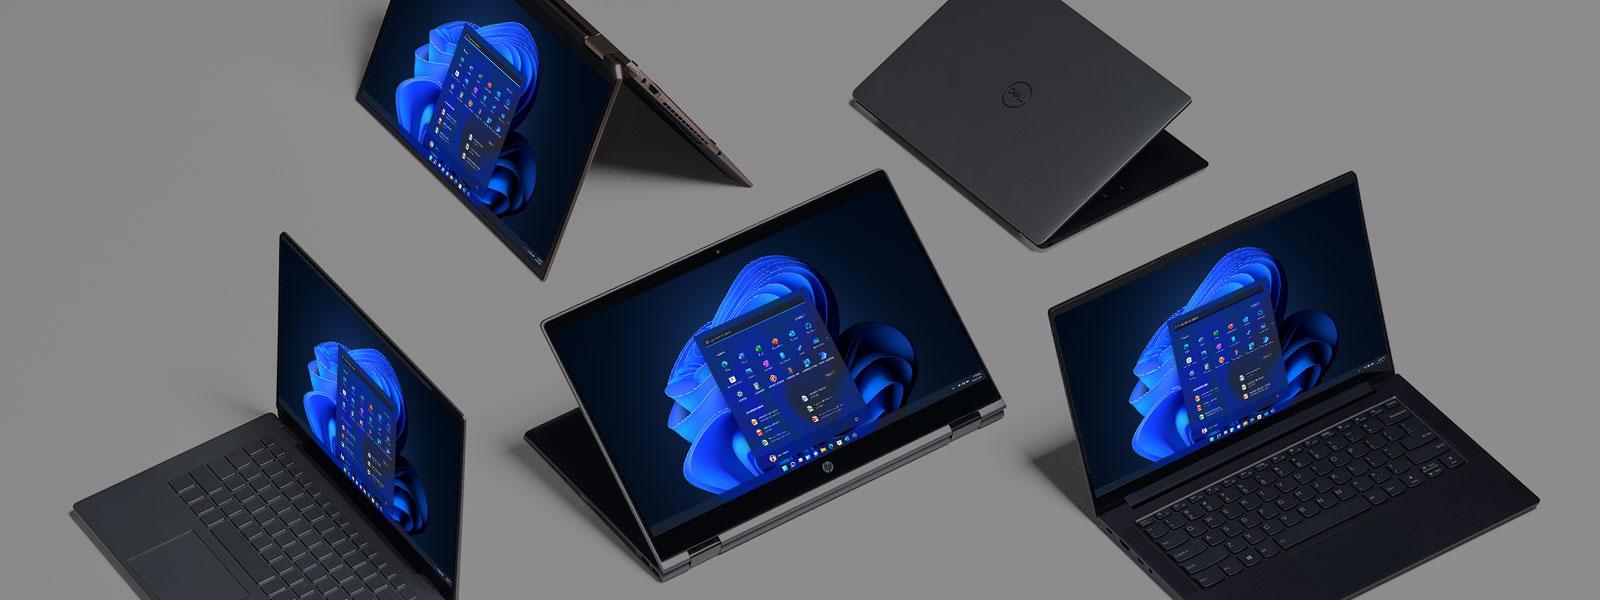 Array of 5 Windows 11 computers